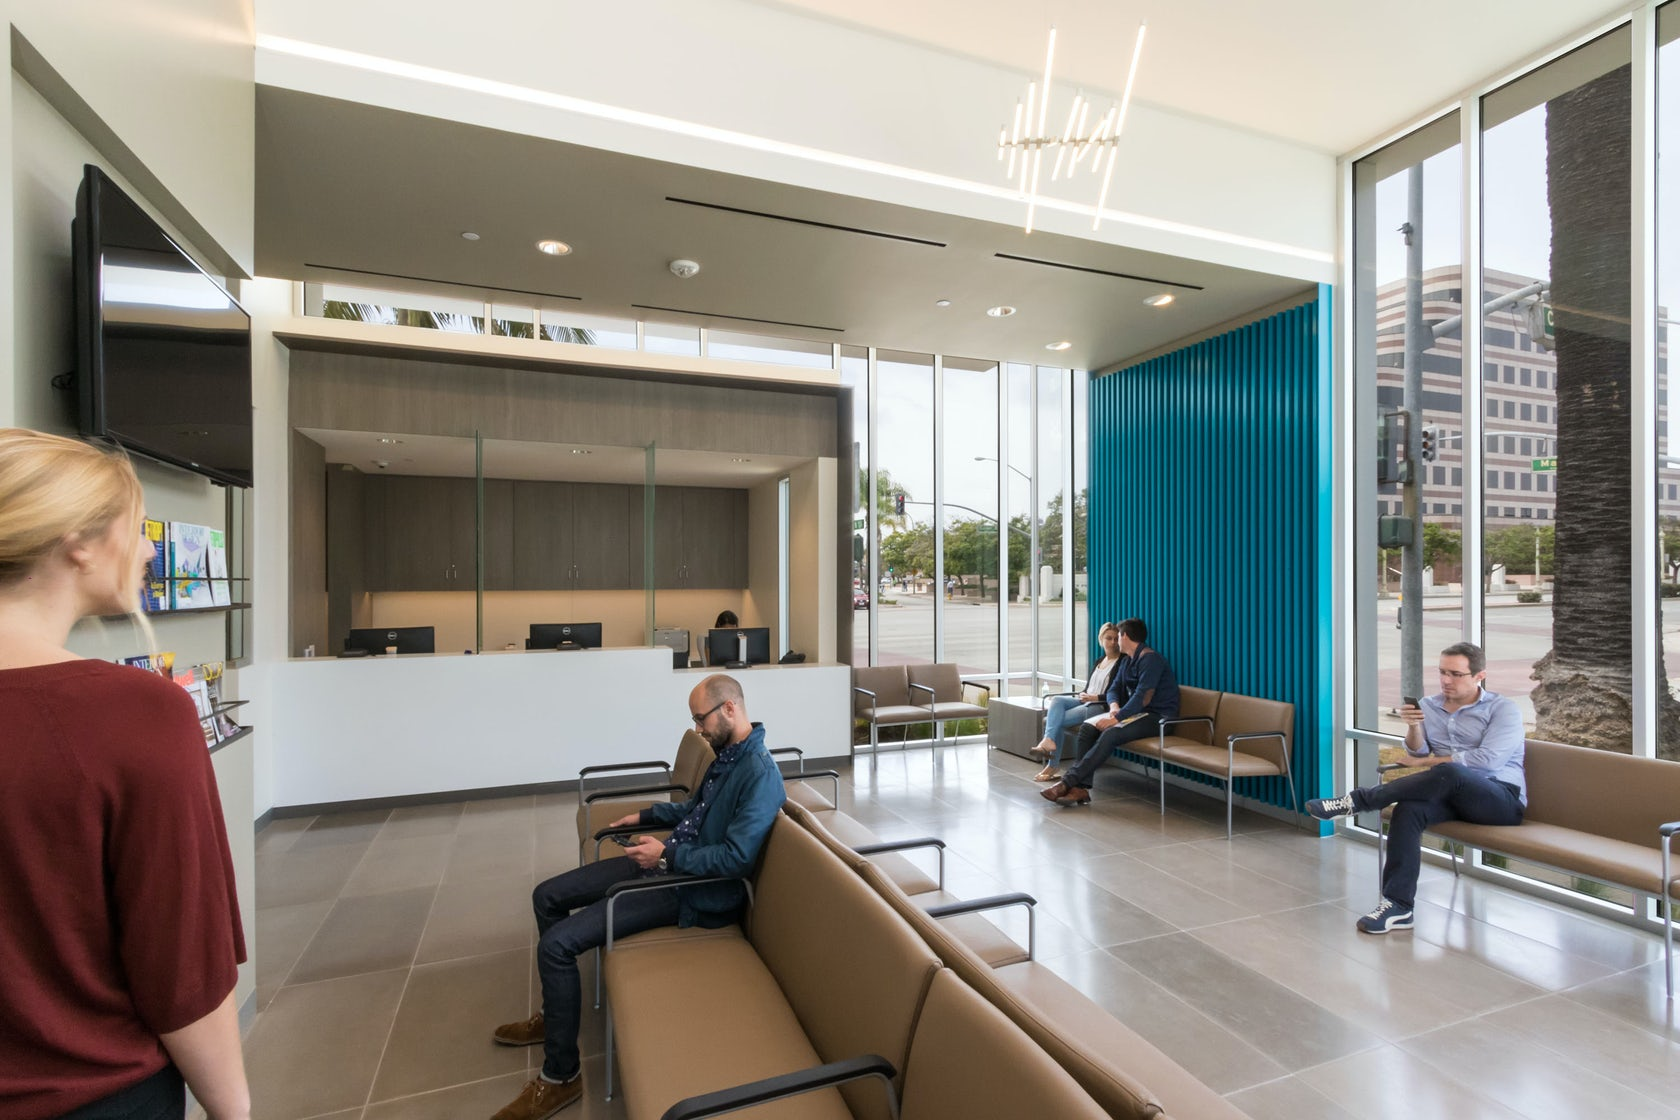 Cedars Sinai Urgent Care on Architizer